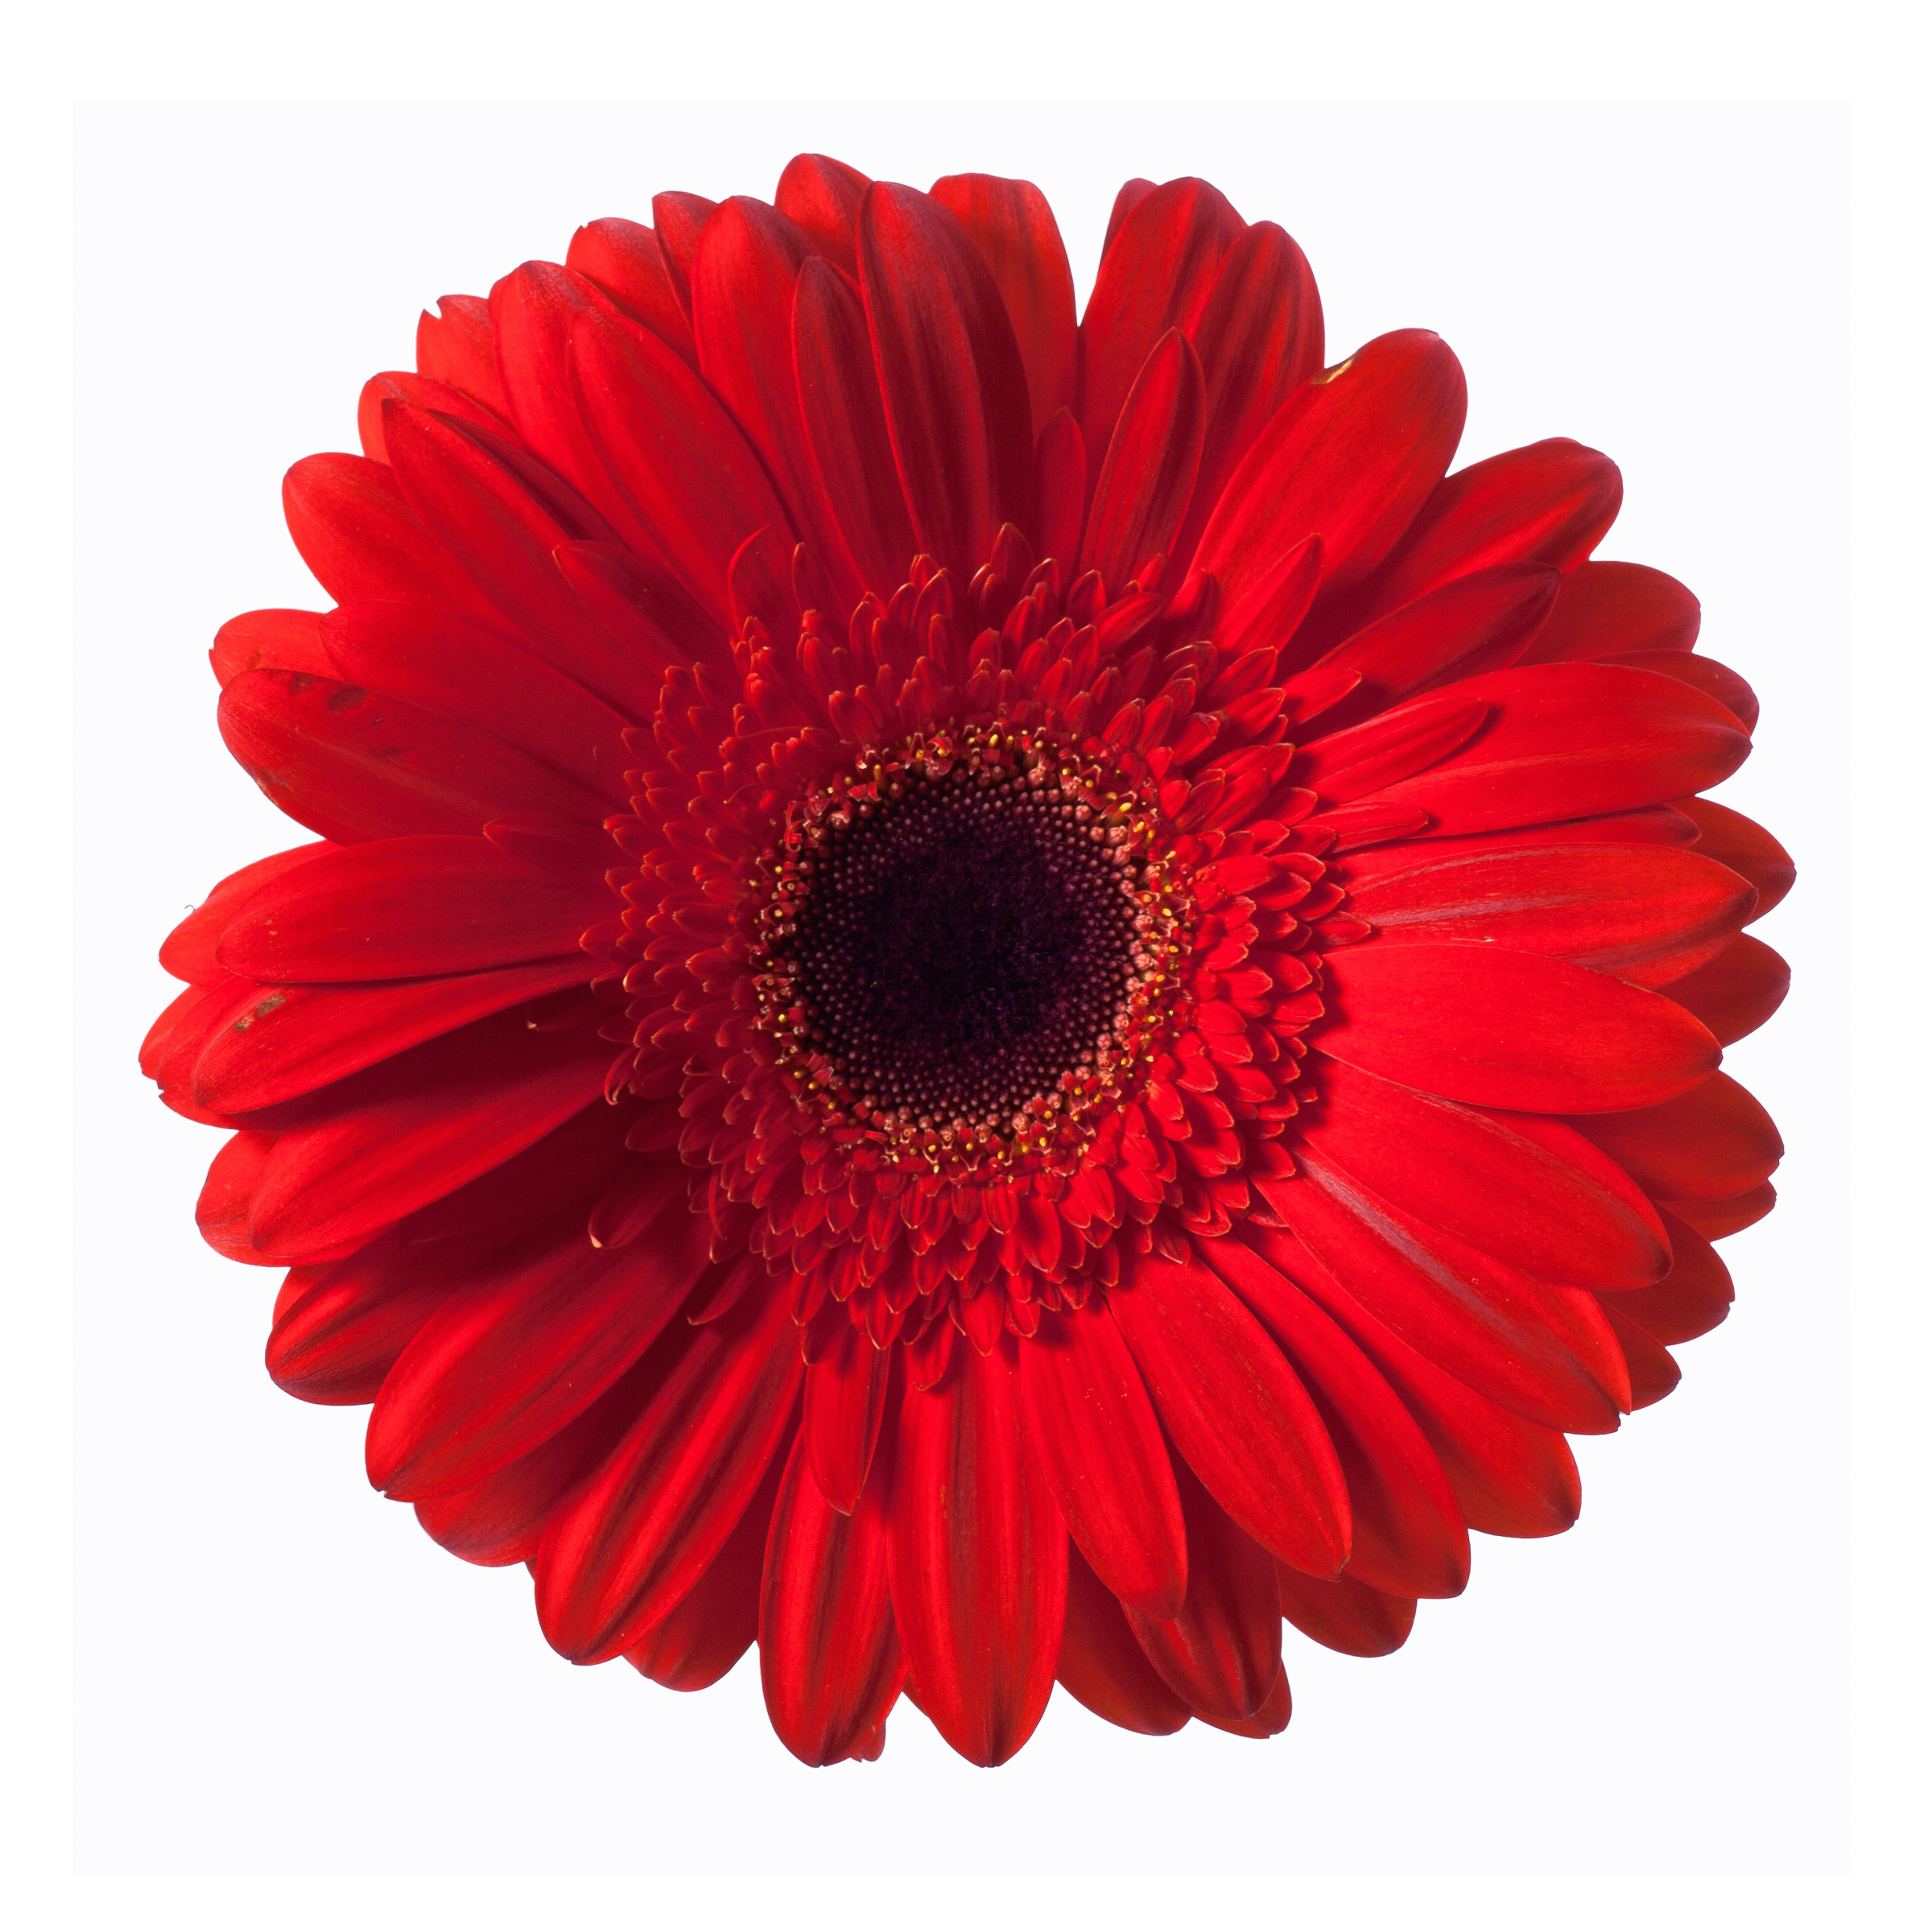 Red gerbera flower photo